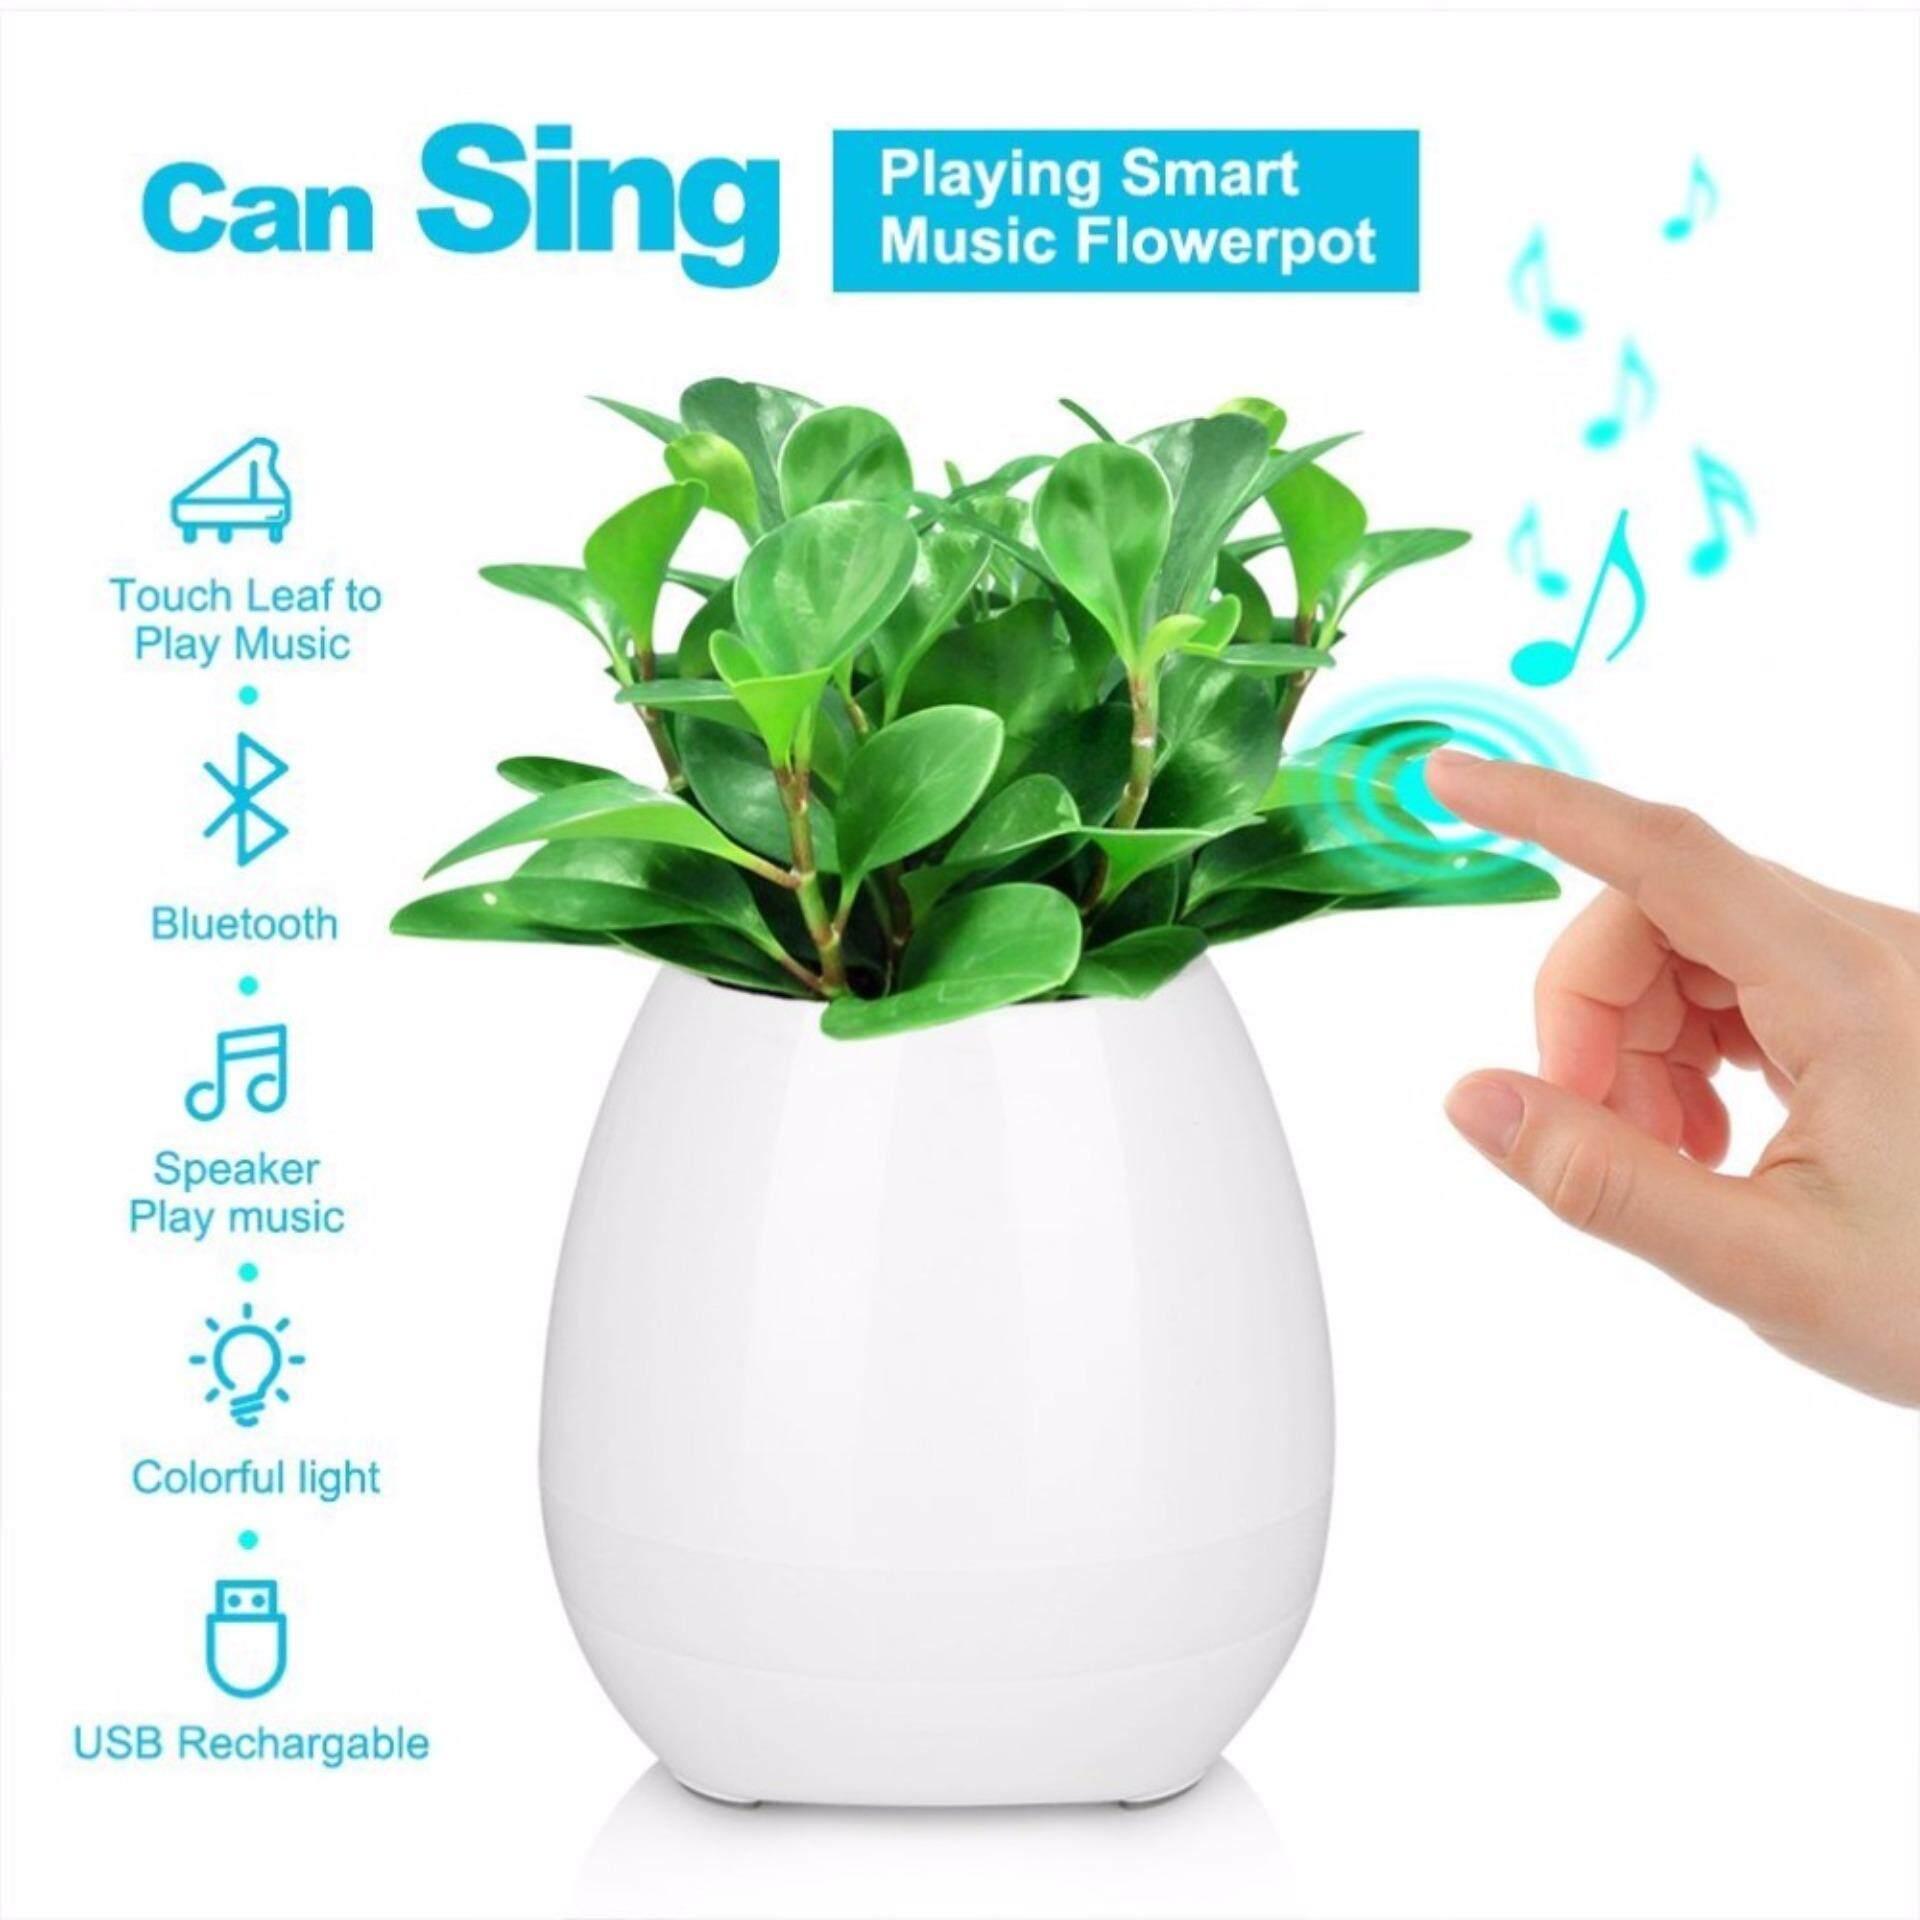 PREMIE K3 Portable Smart Bluetooth Speaker Sensor Music Flower Pots with Colorful LED Night Light